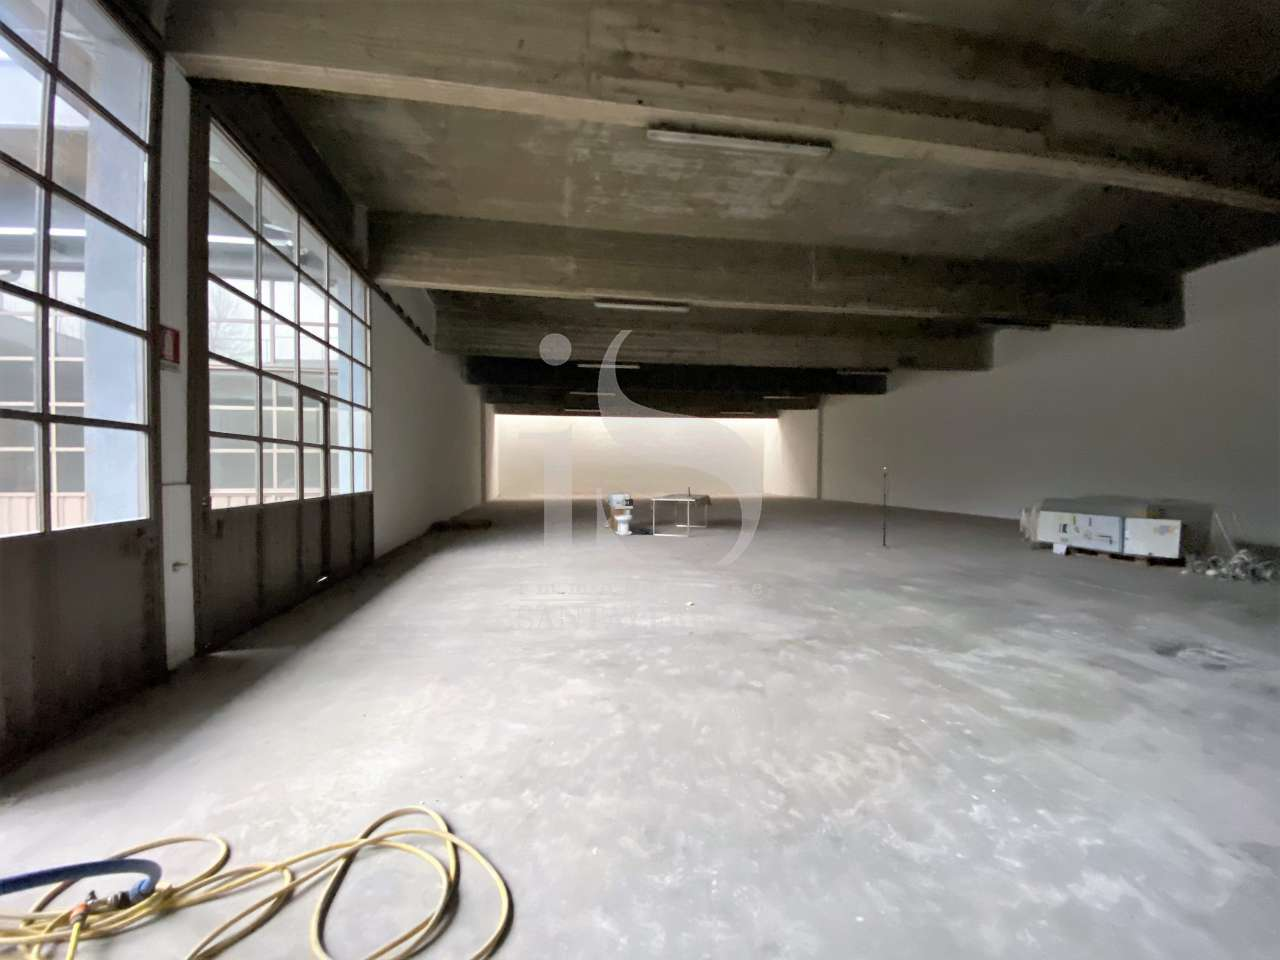 Capannone Industriale MONZA HOME 2003-2